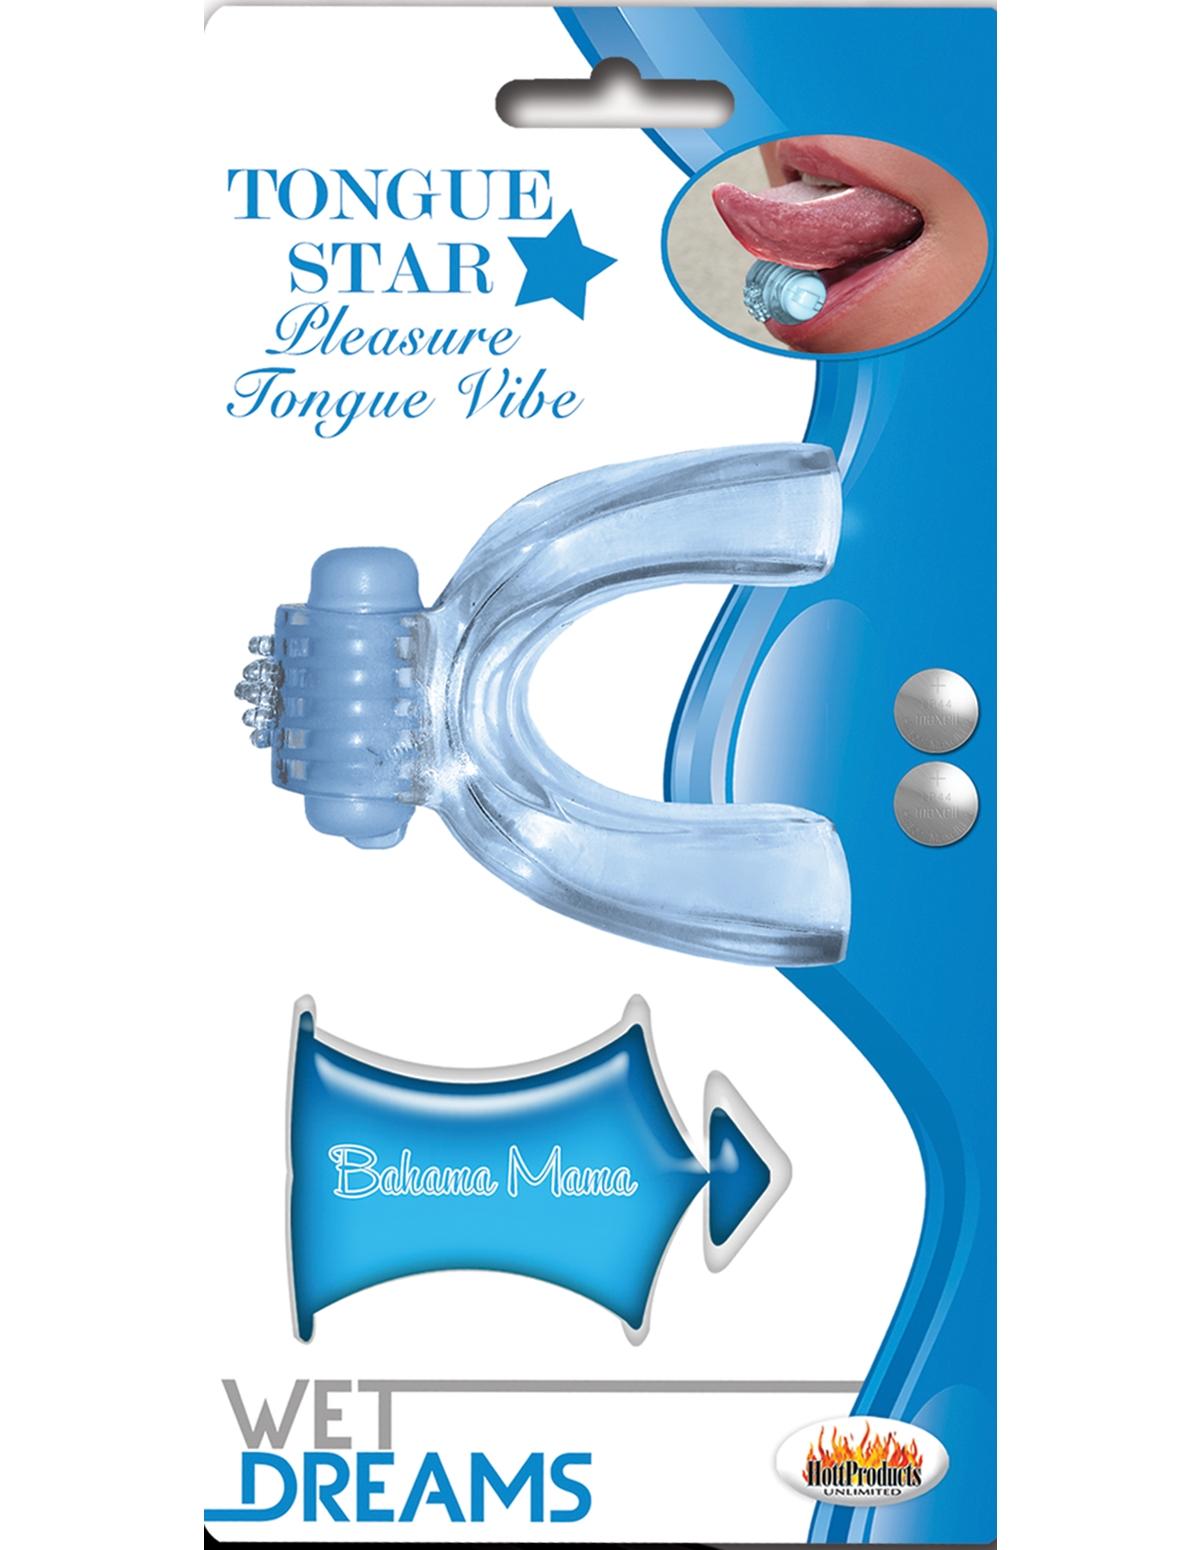 Tongue Star Vibrator With Liquor Lube